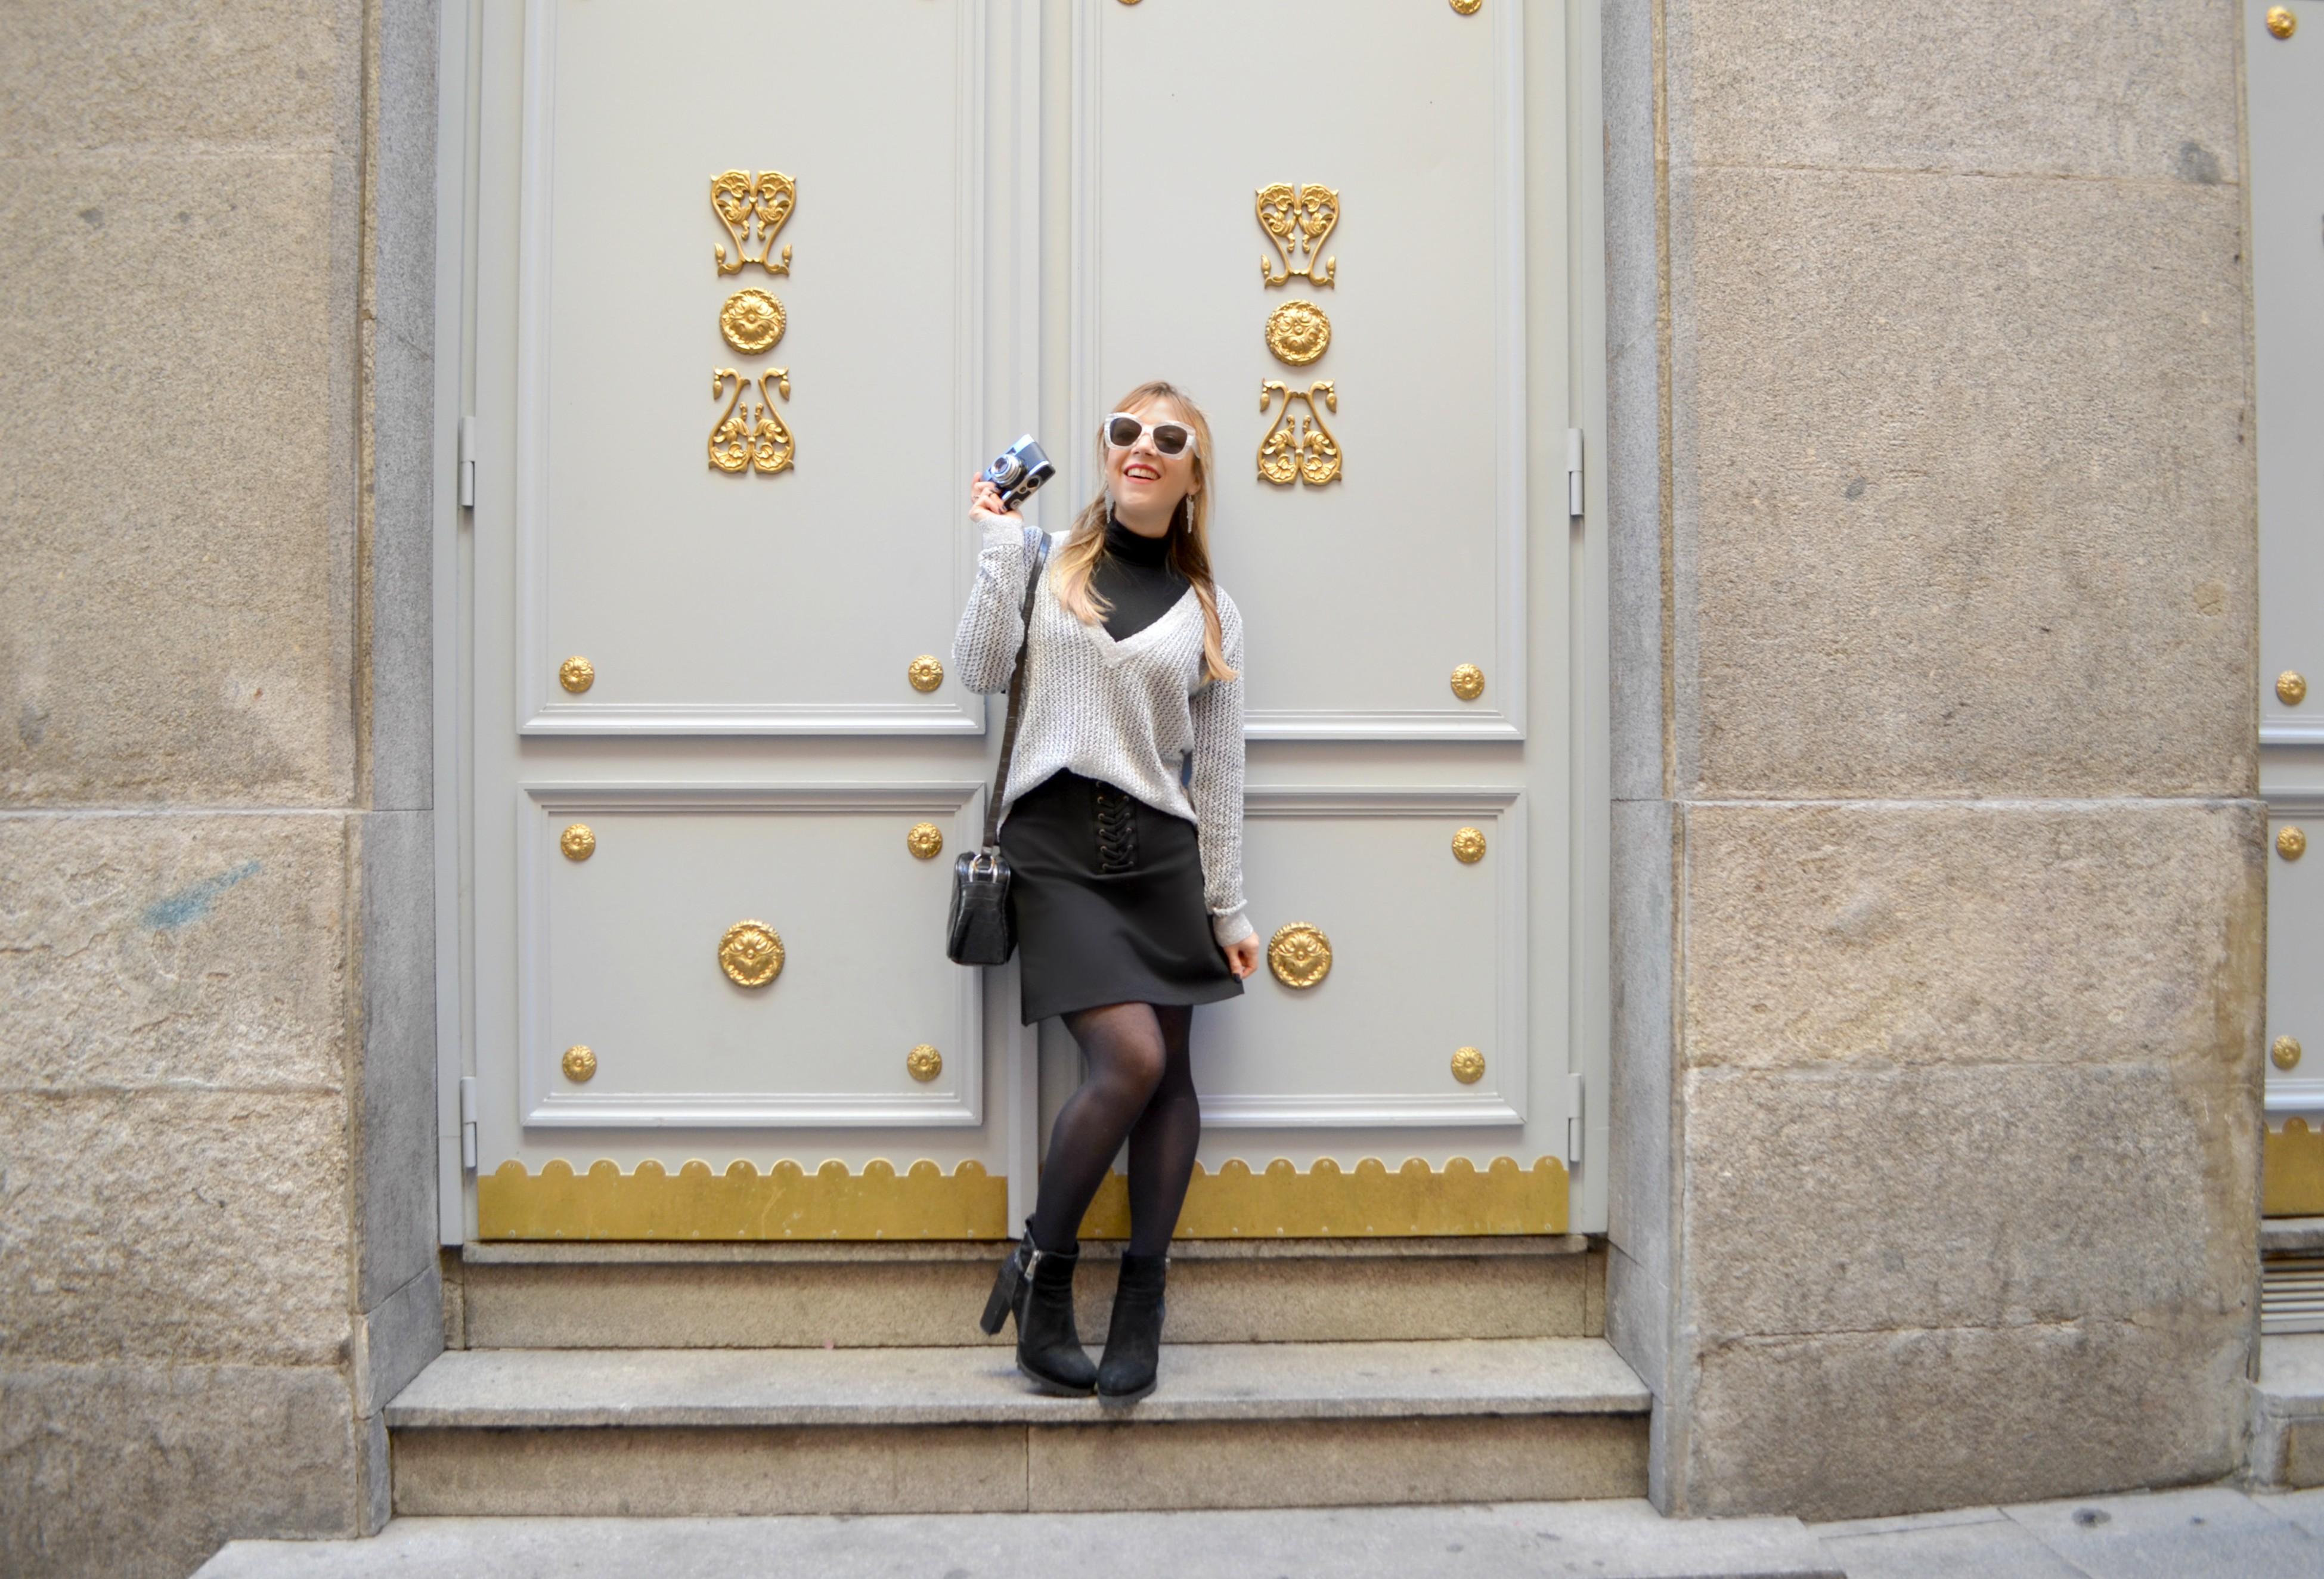 Amichi-Madrid-street-style-ChicAdicta-blog-de-moda-fashionista-Chic-Adicta-bolso-negro-silver-look-AlmaenPena-shoes-PiensaenChic-Piensa-en-Chic